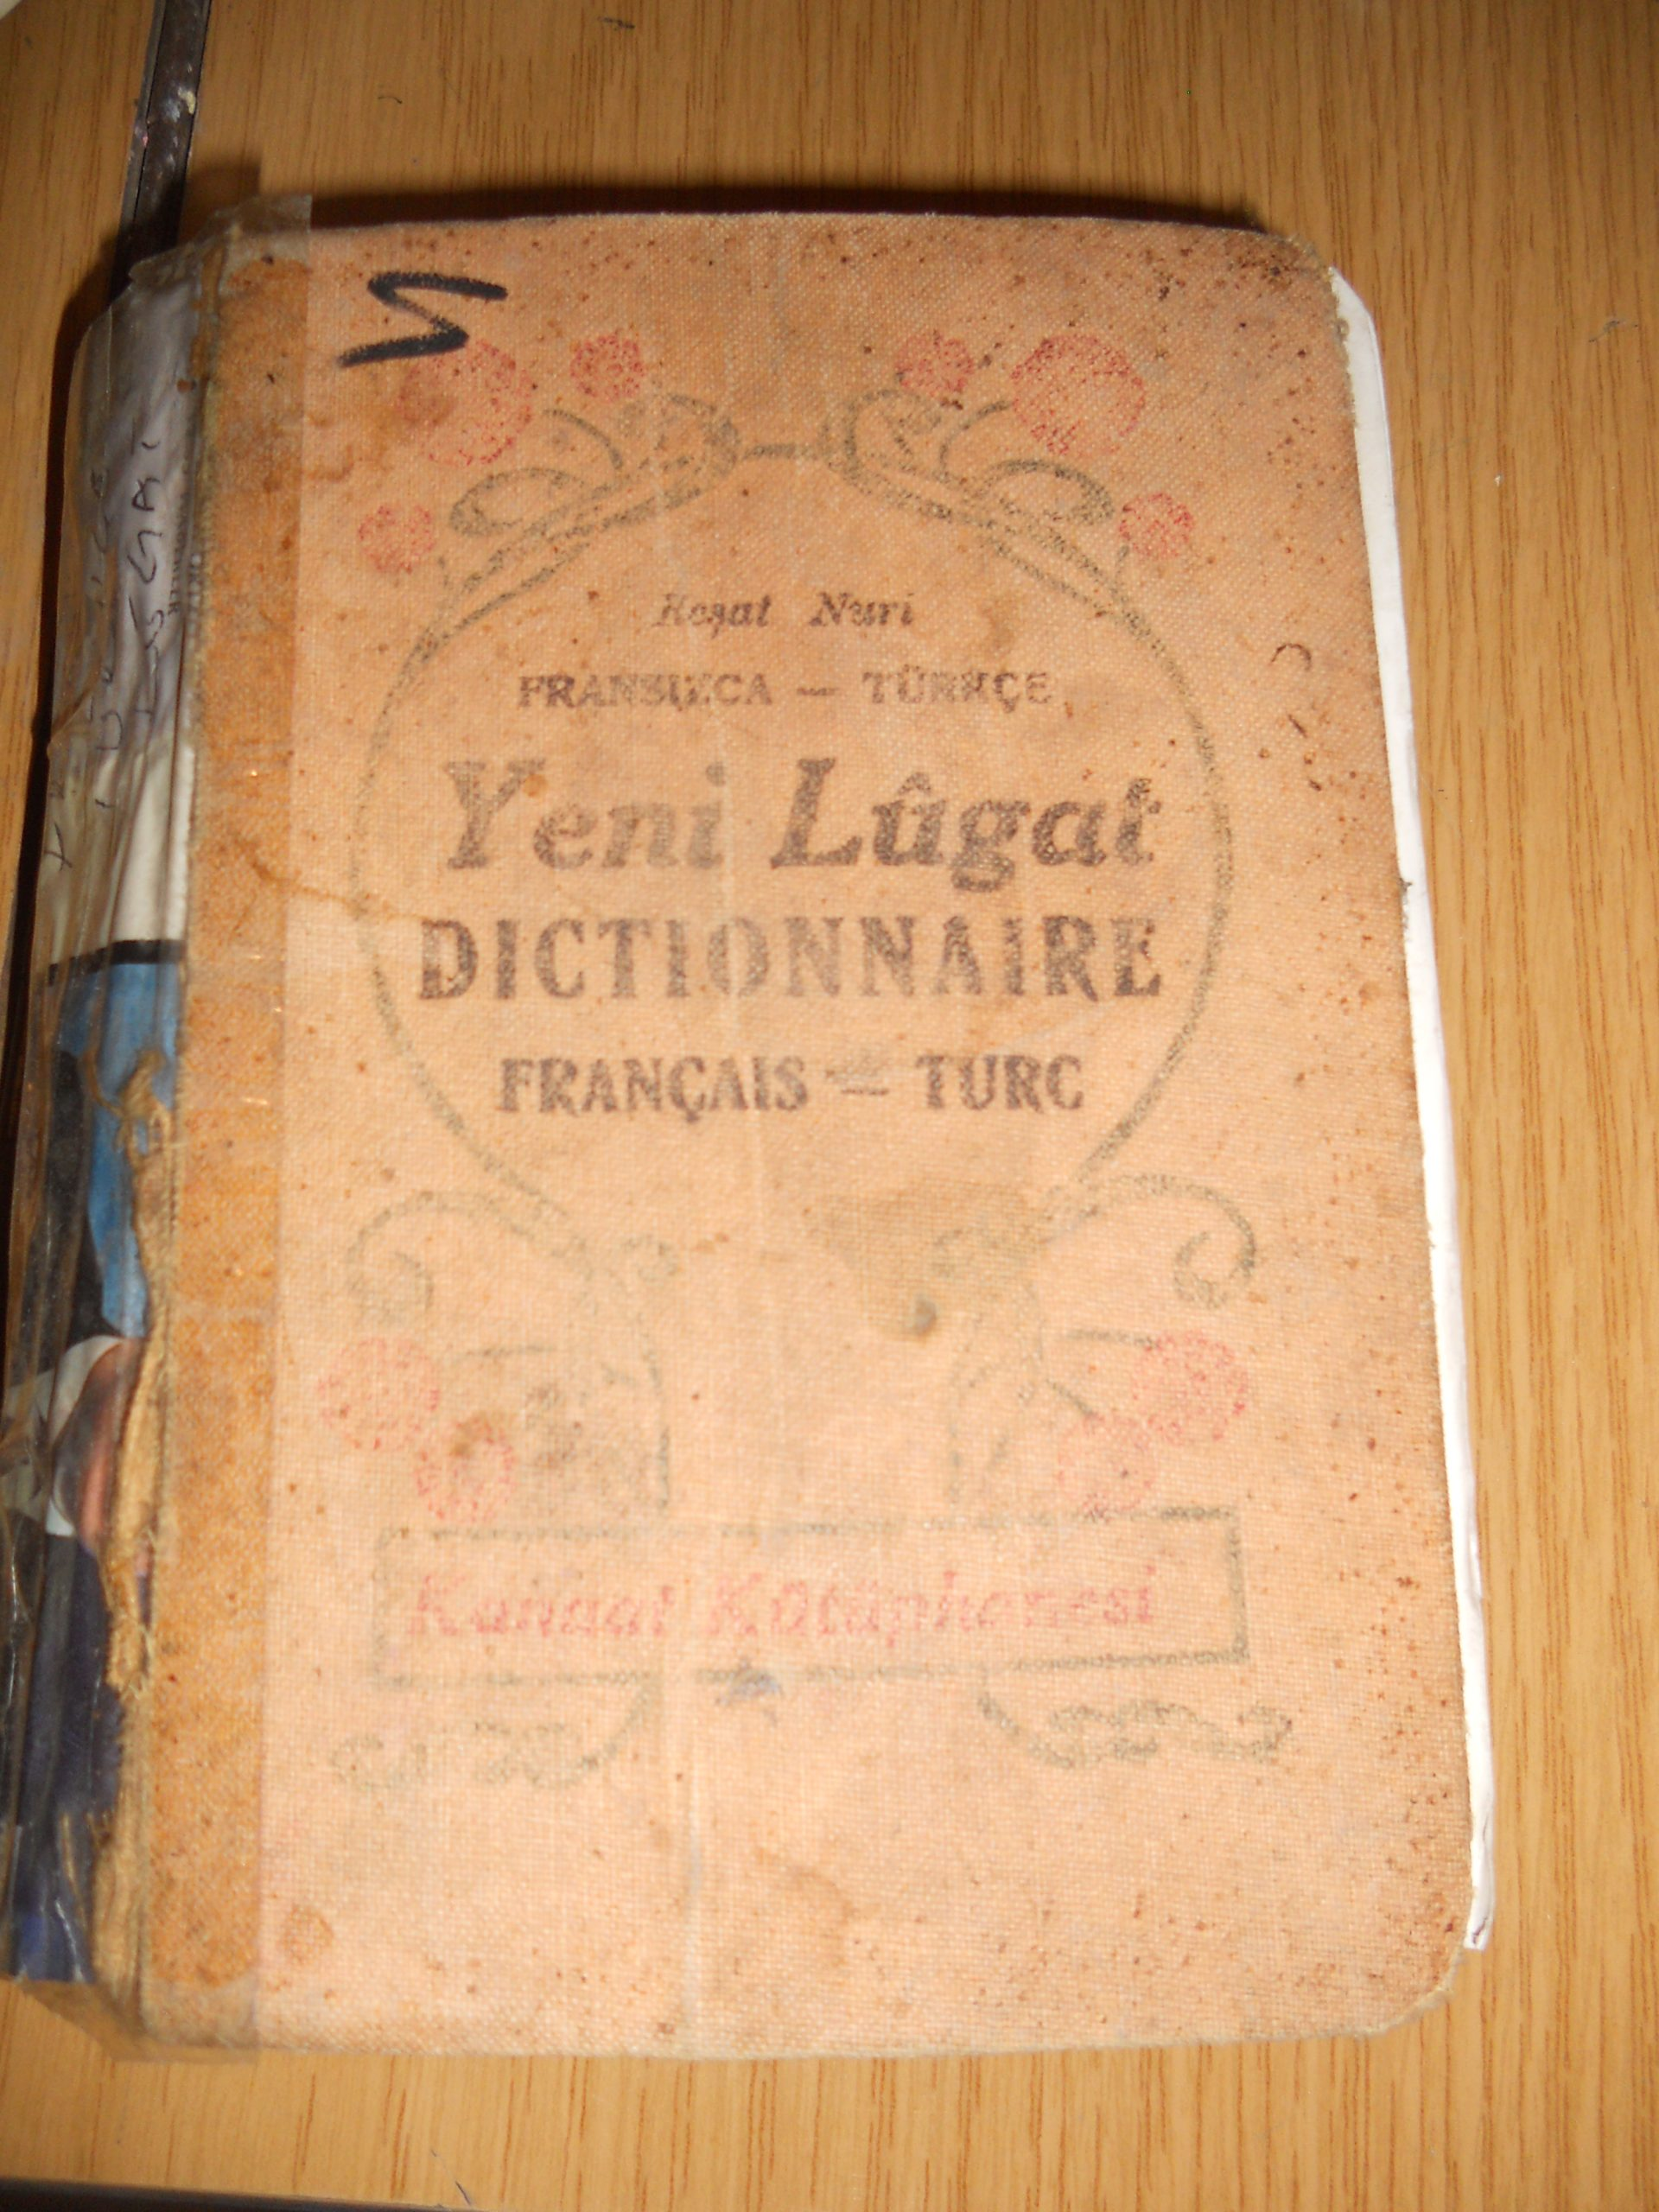 FRANSIZCA TÜRKÇE Yeni Lügat/Dictionnaire/ 1931 BASIMI/ 25 tl